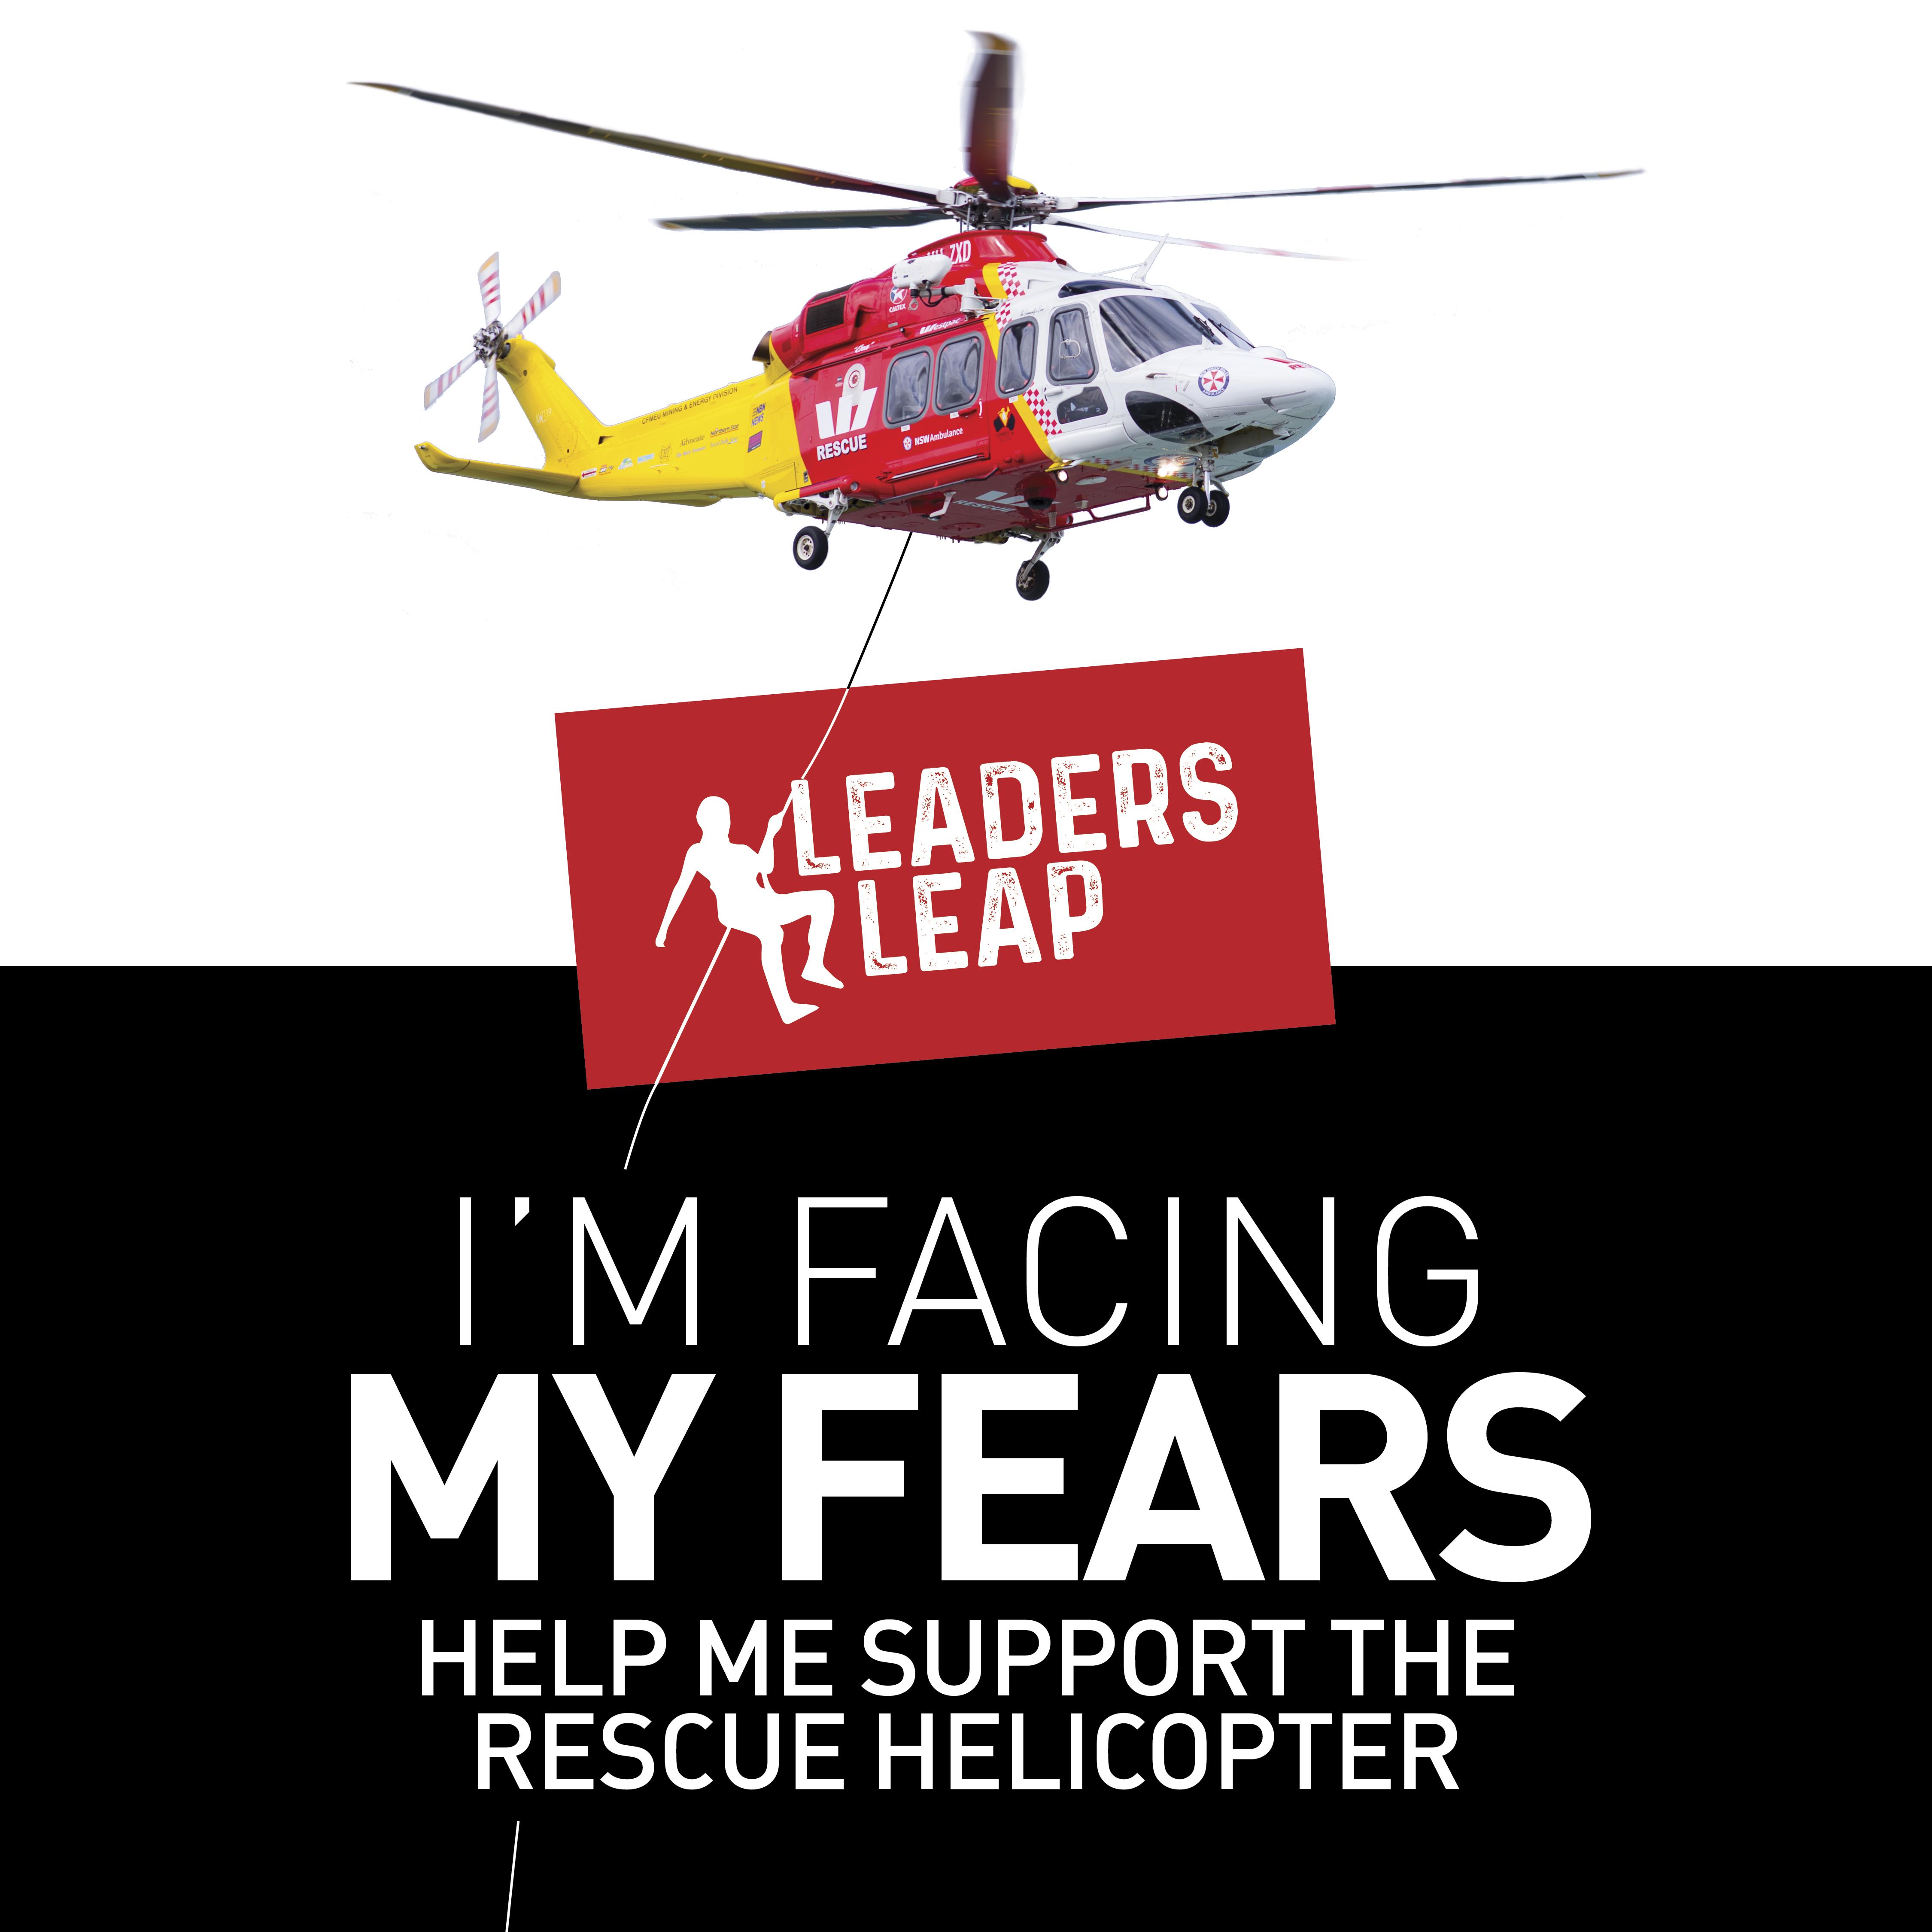 LeadersLeap Facing Fears AW139 Social Tile